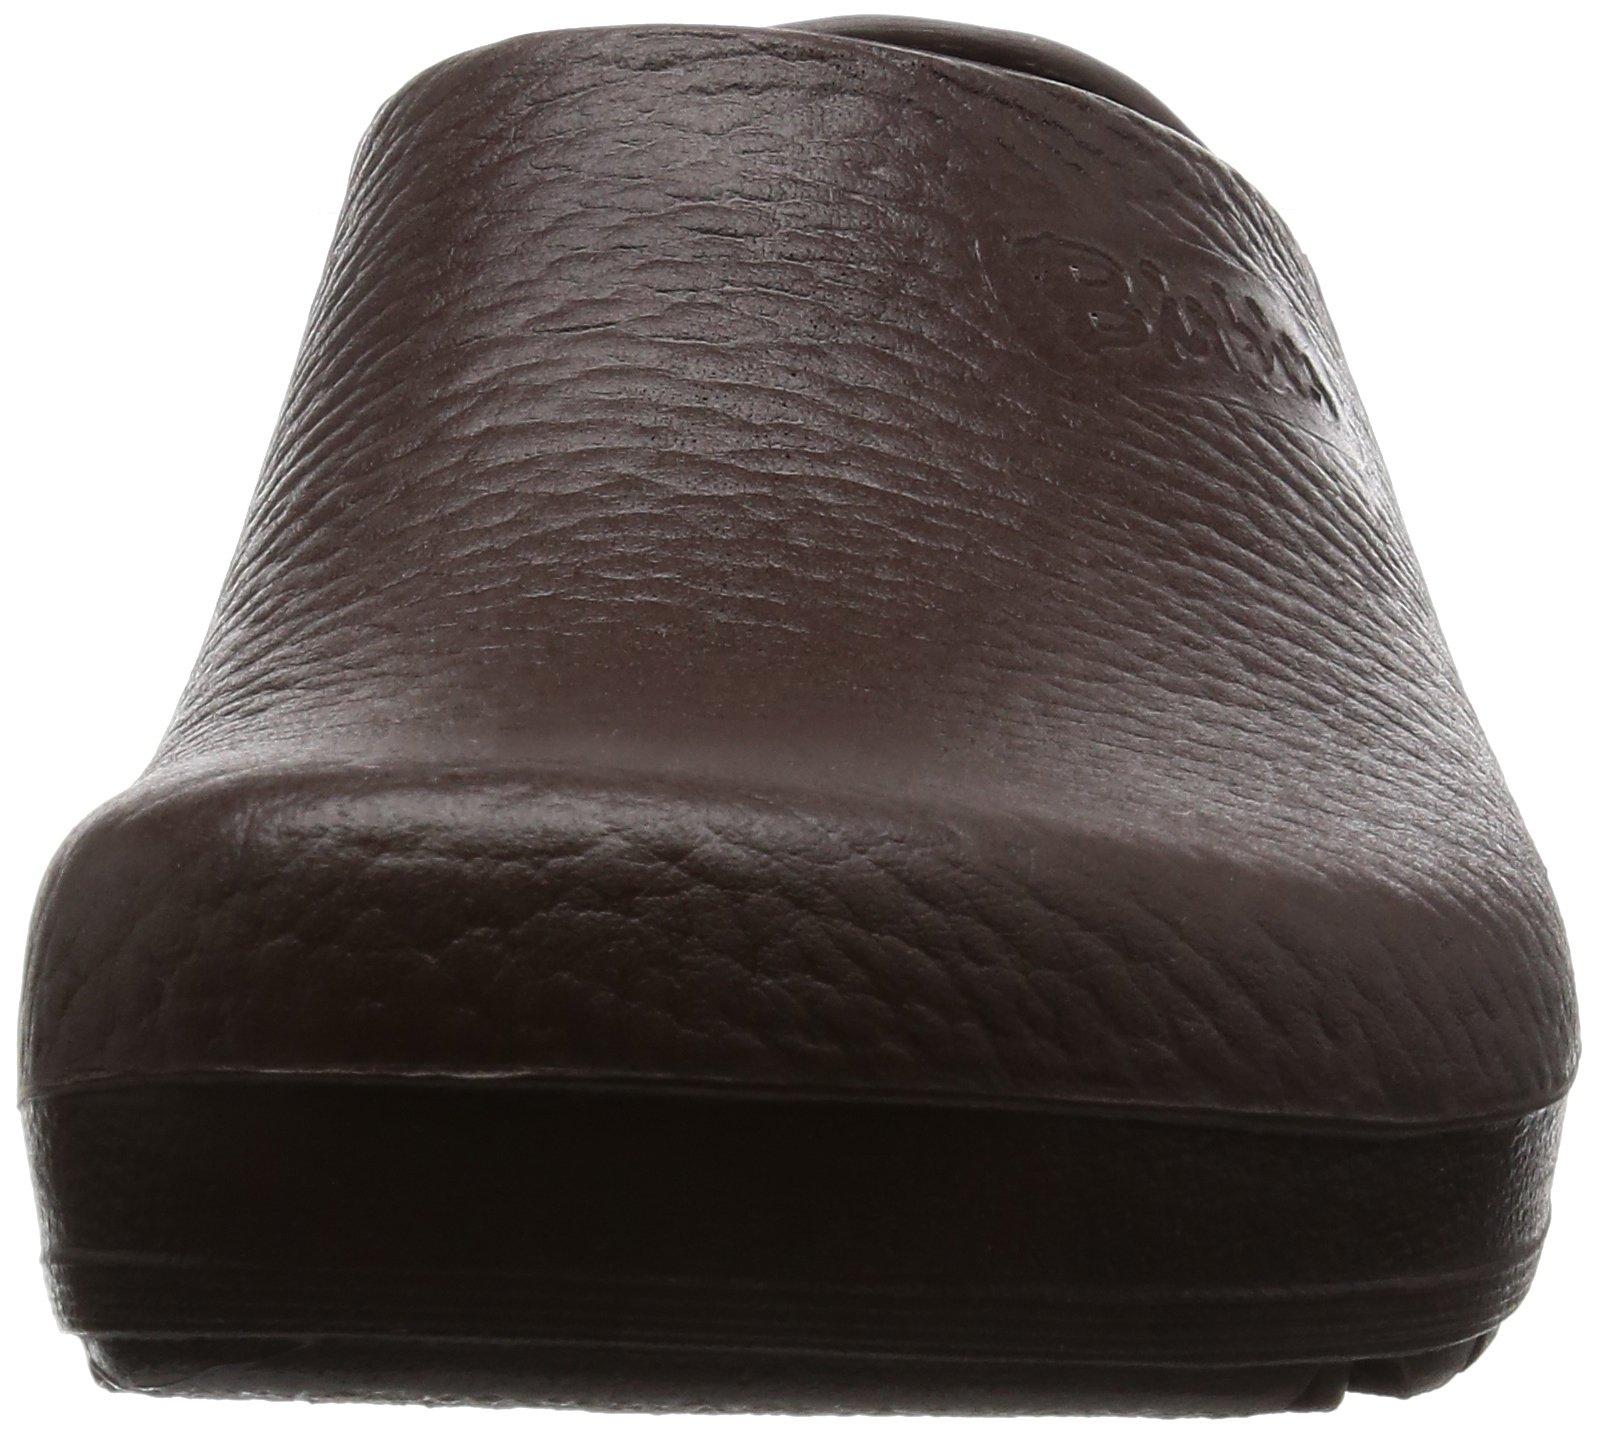 Birkenstock Men´s Profi-Birki Brown Alpro-Foam Sandals 40 EU (M7/L9 US) R 074061 by Birkenstock (Image #4)